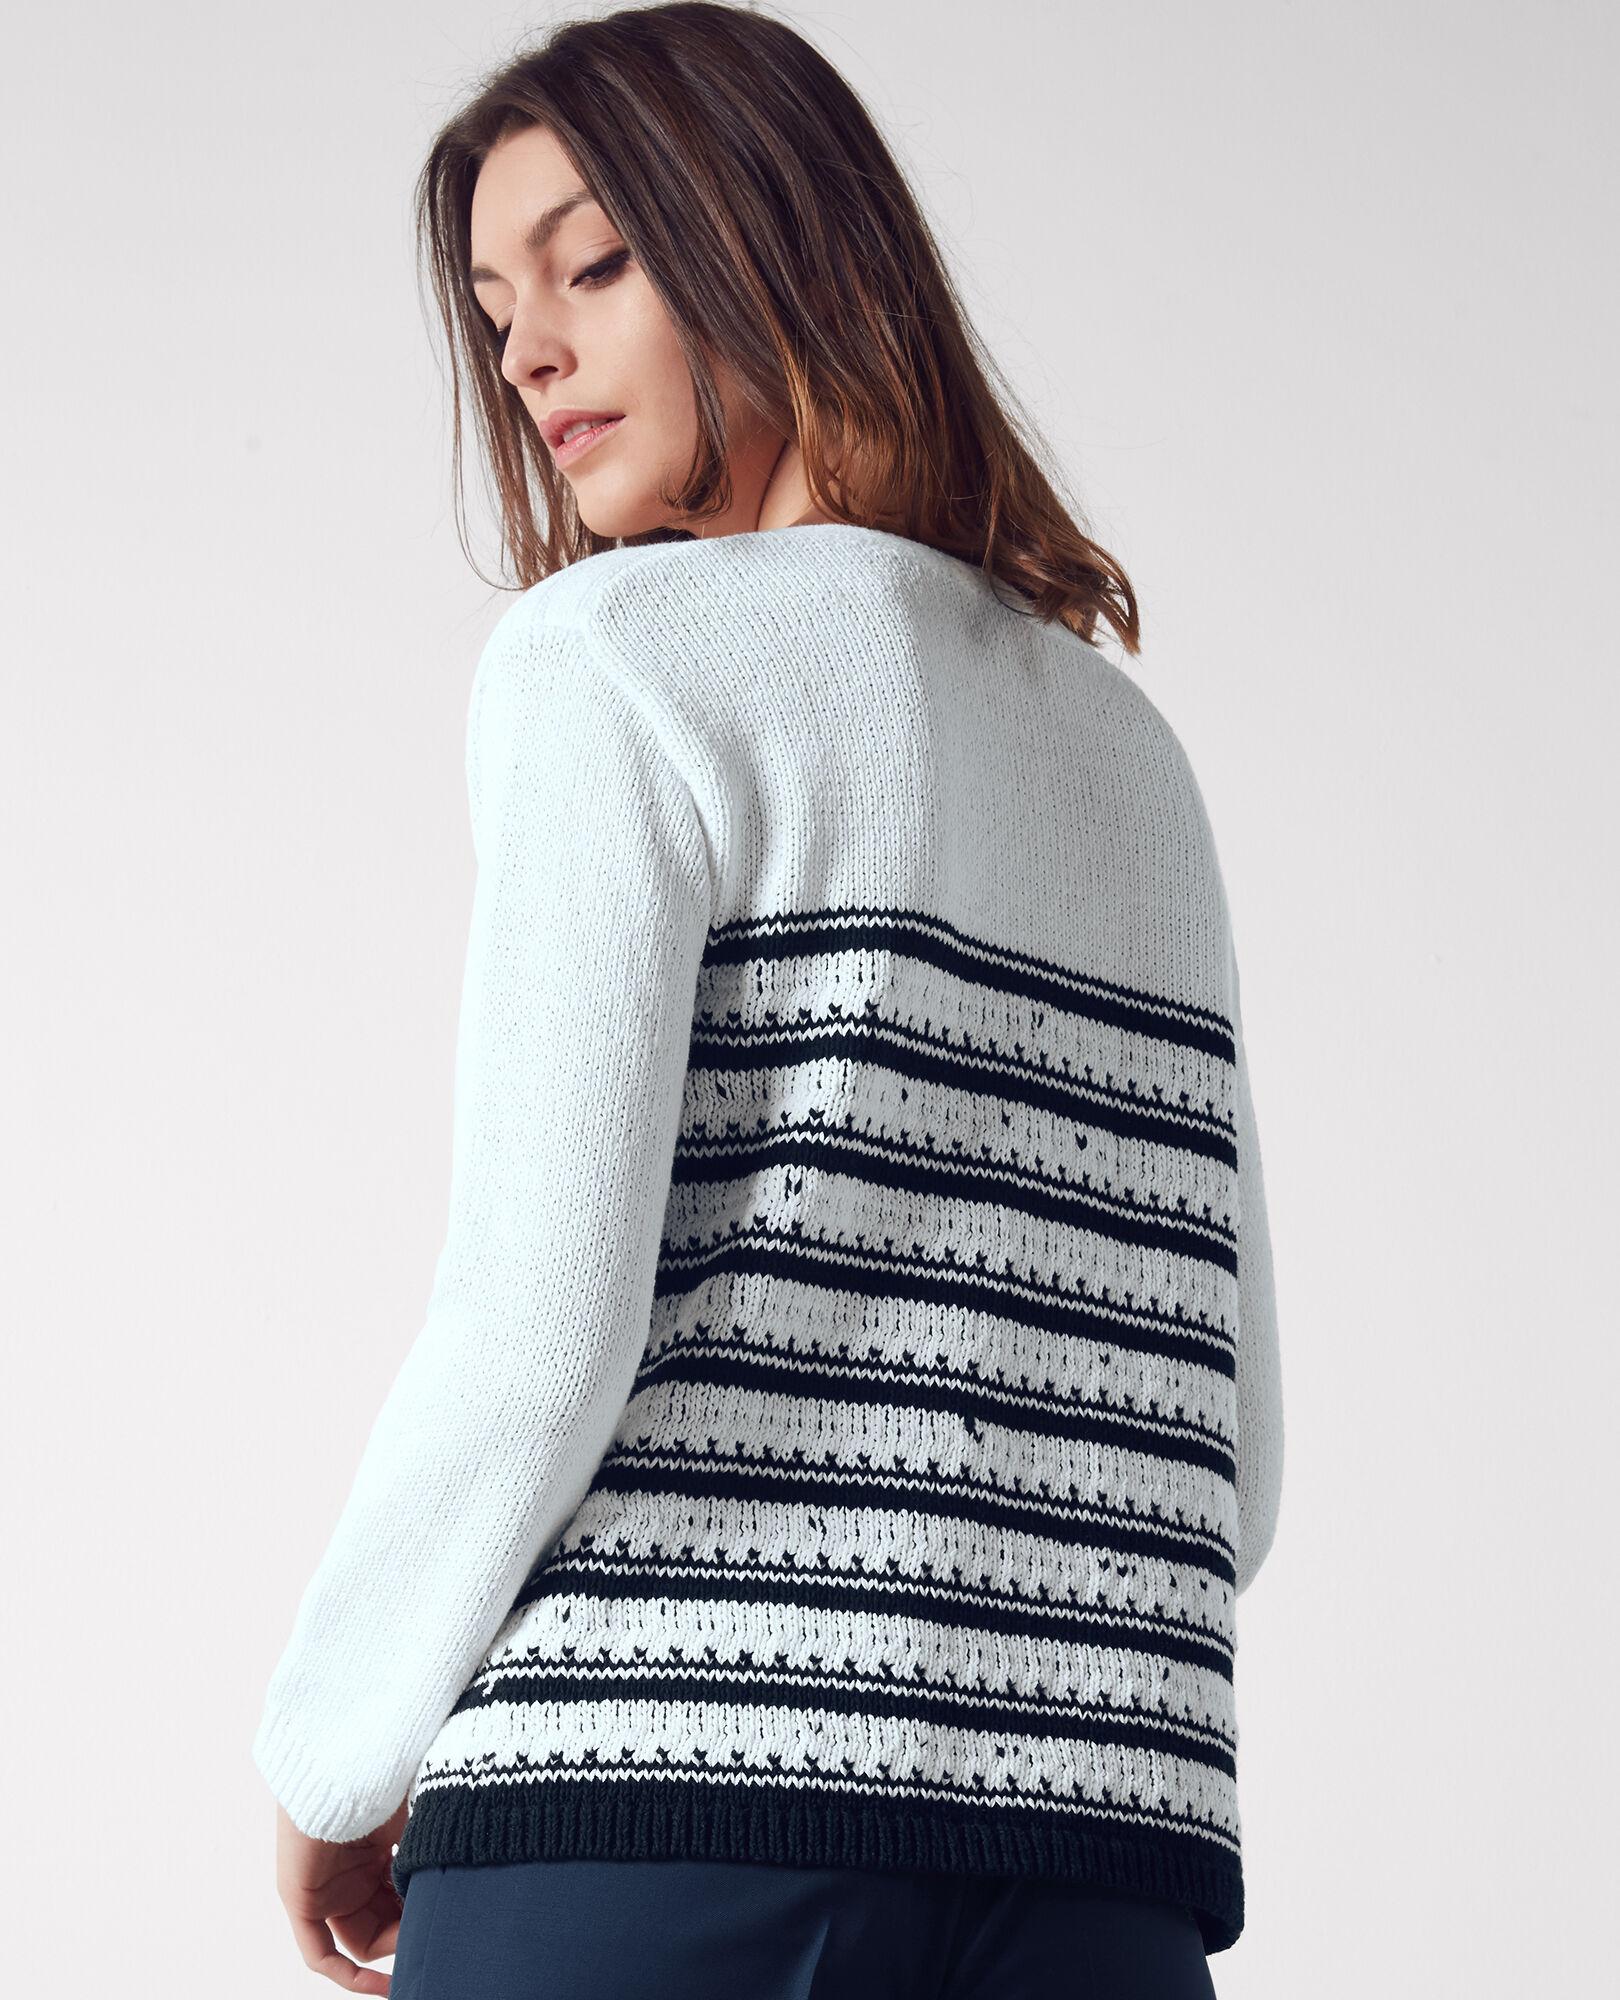 Breton-style striped jumper White/dark navy Cosette